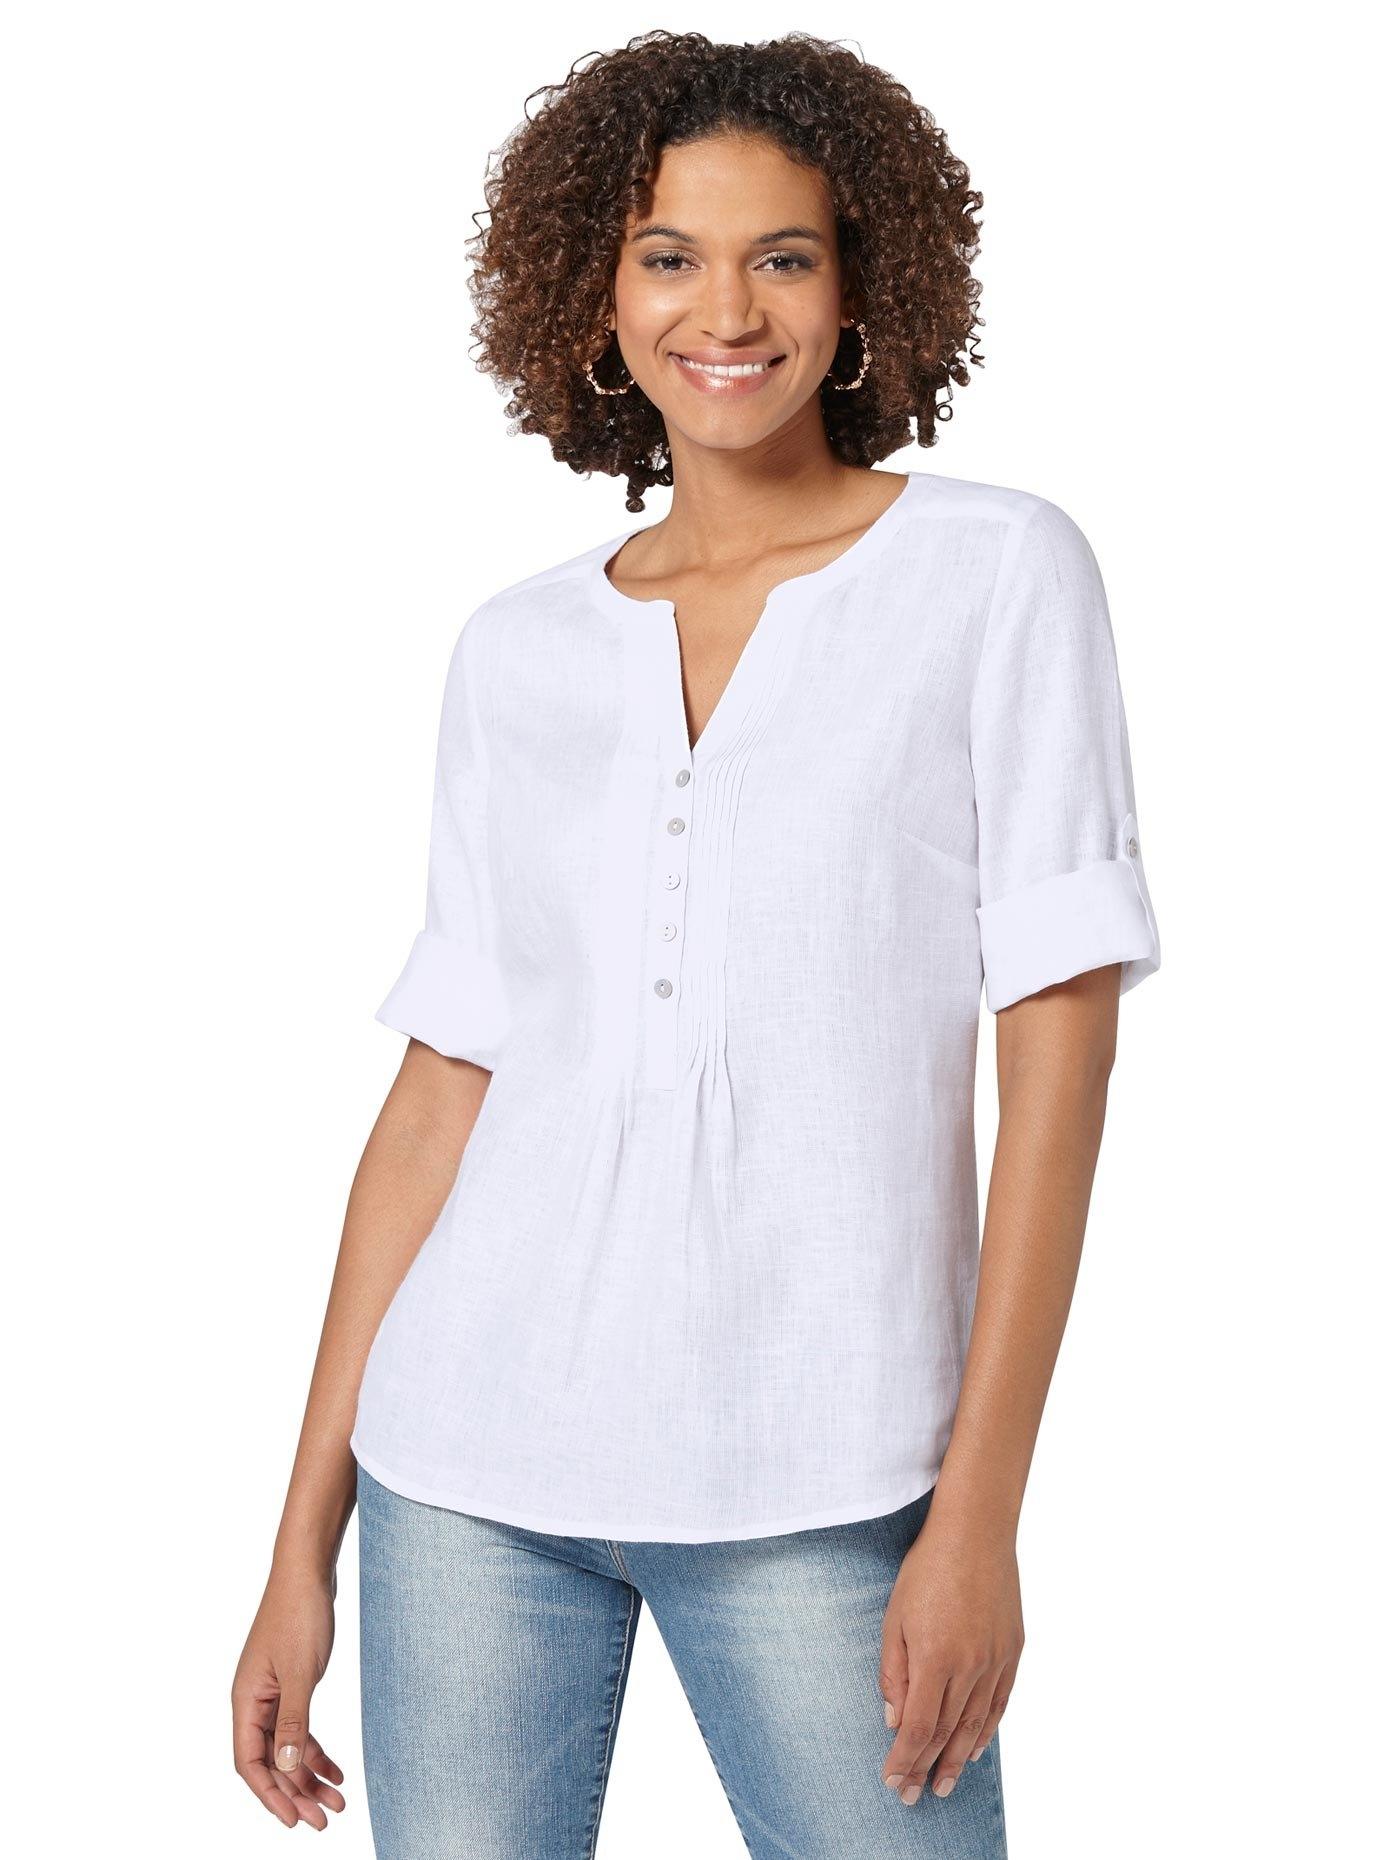 Casual Looks overhemdblouse - verschillende betaalmethodes